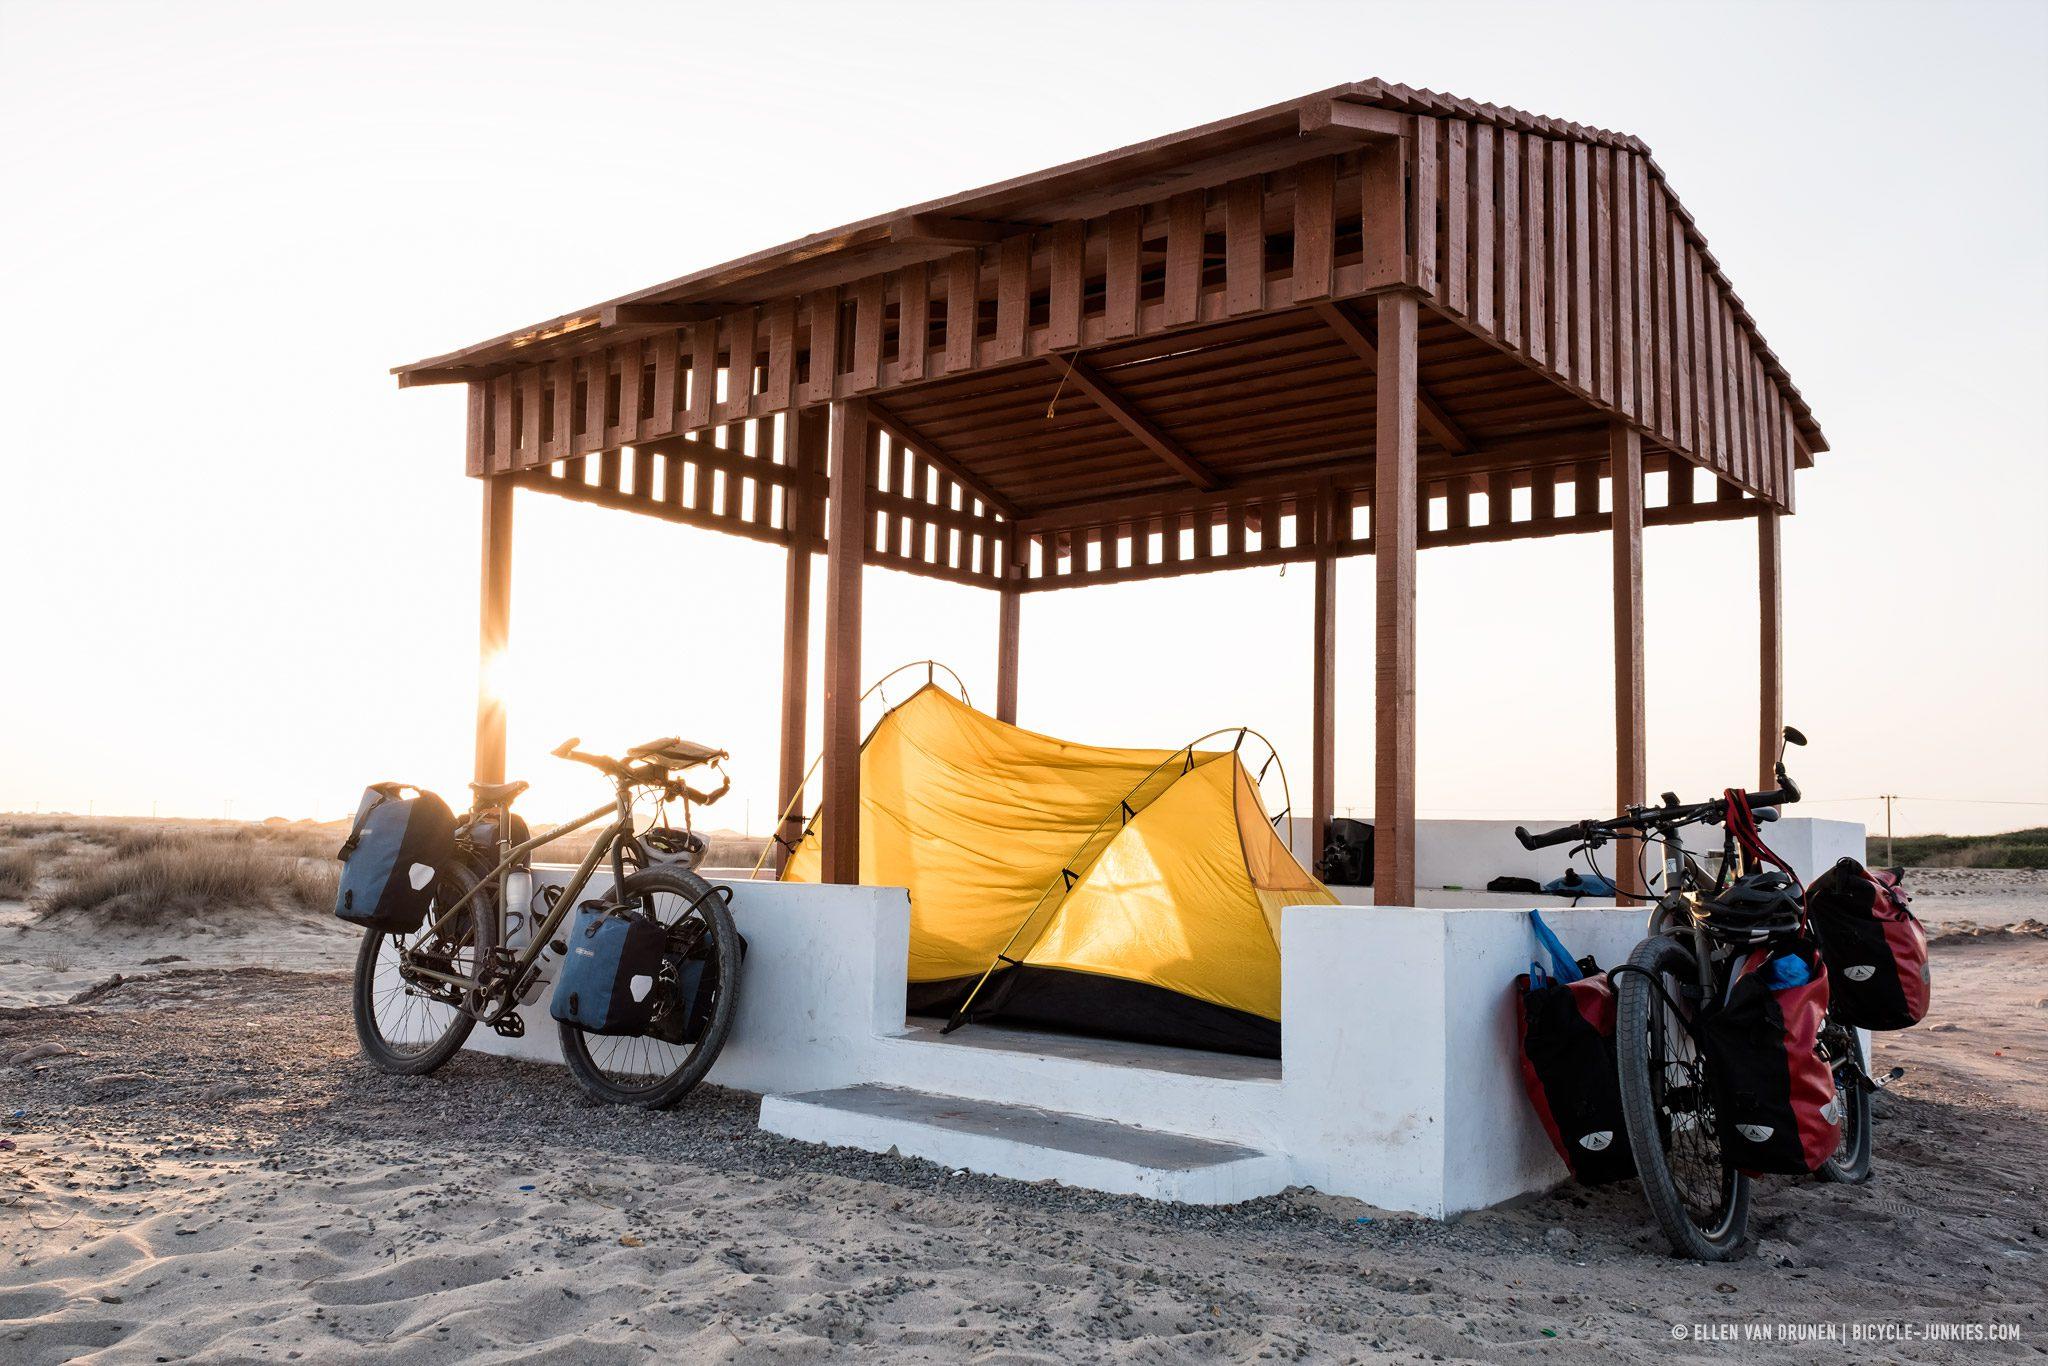 Our camp spot near the beach